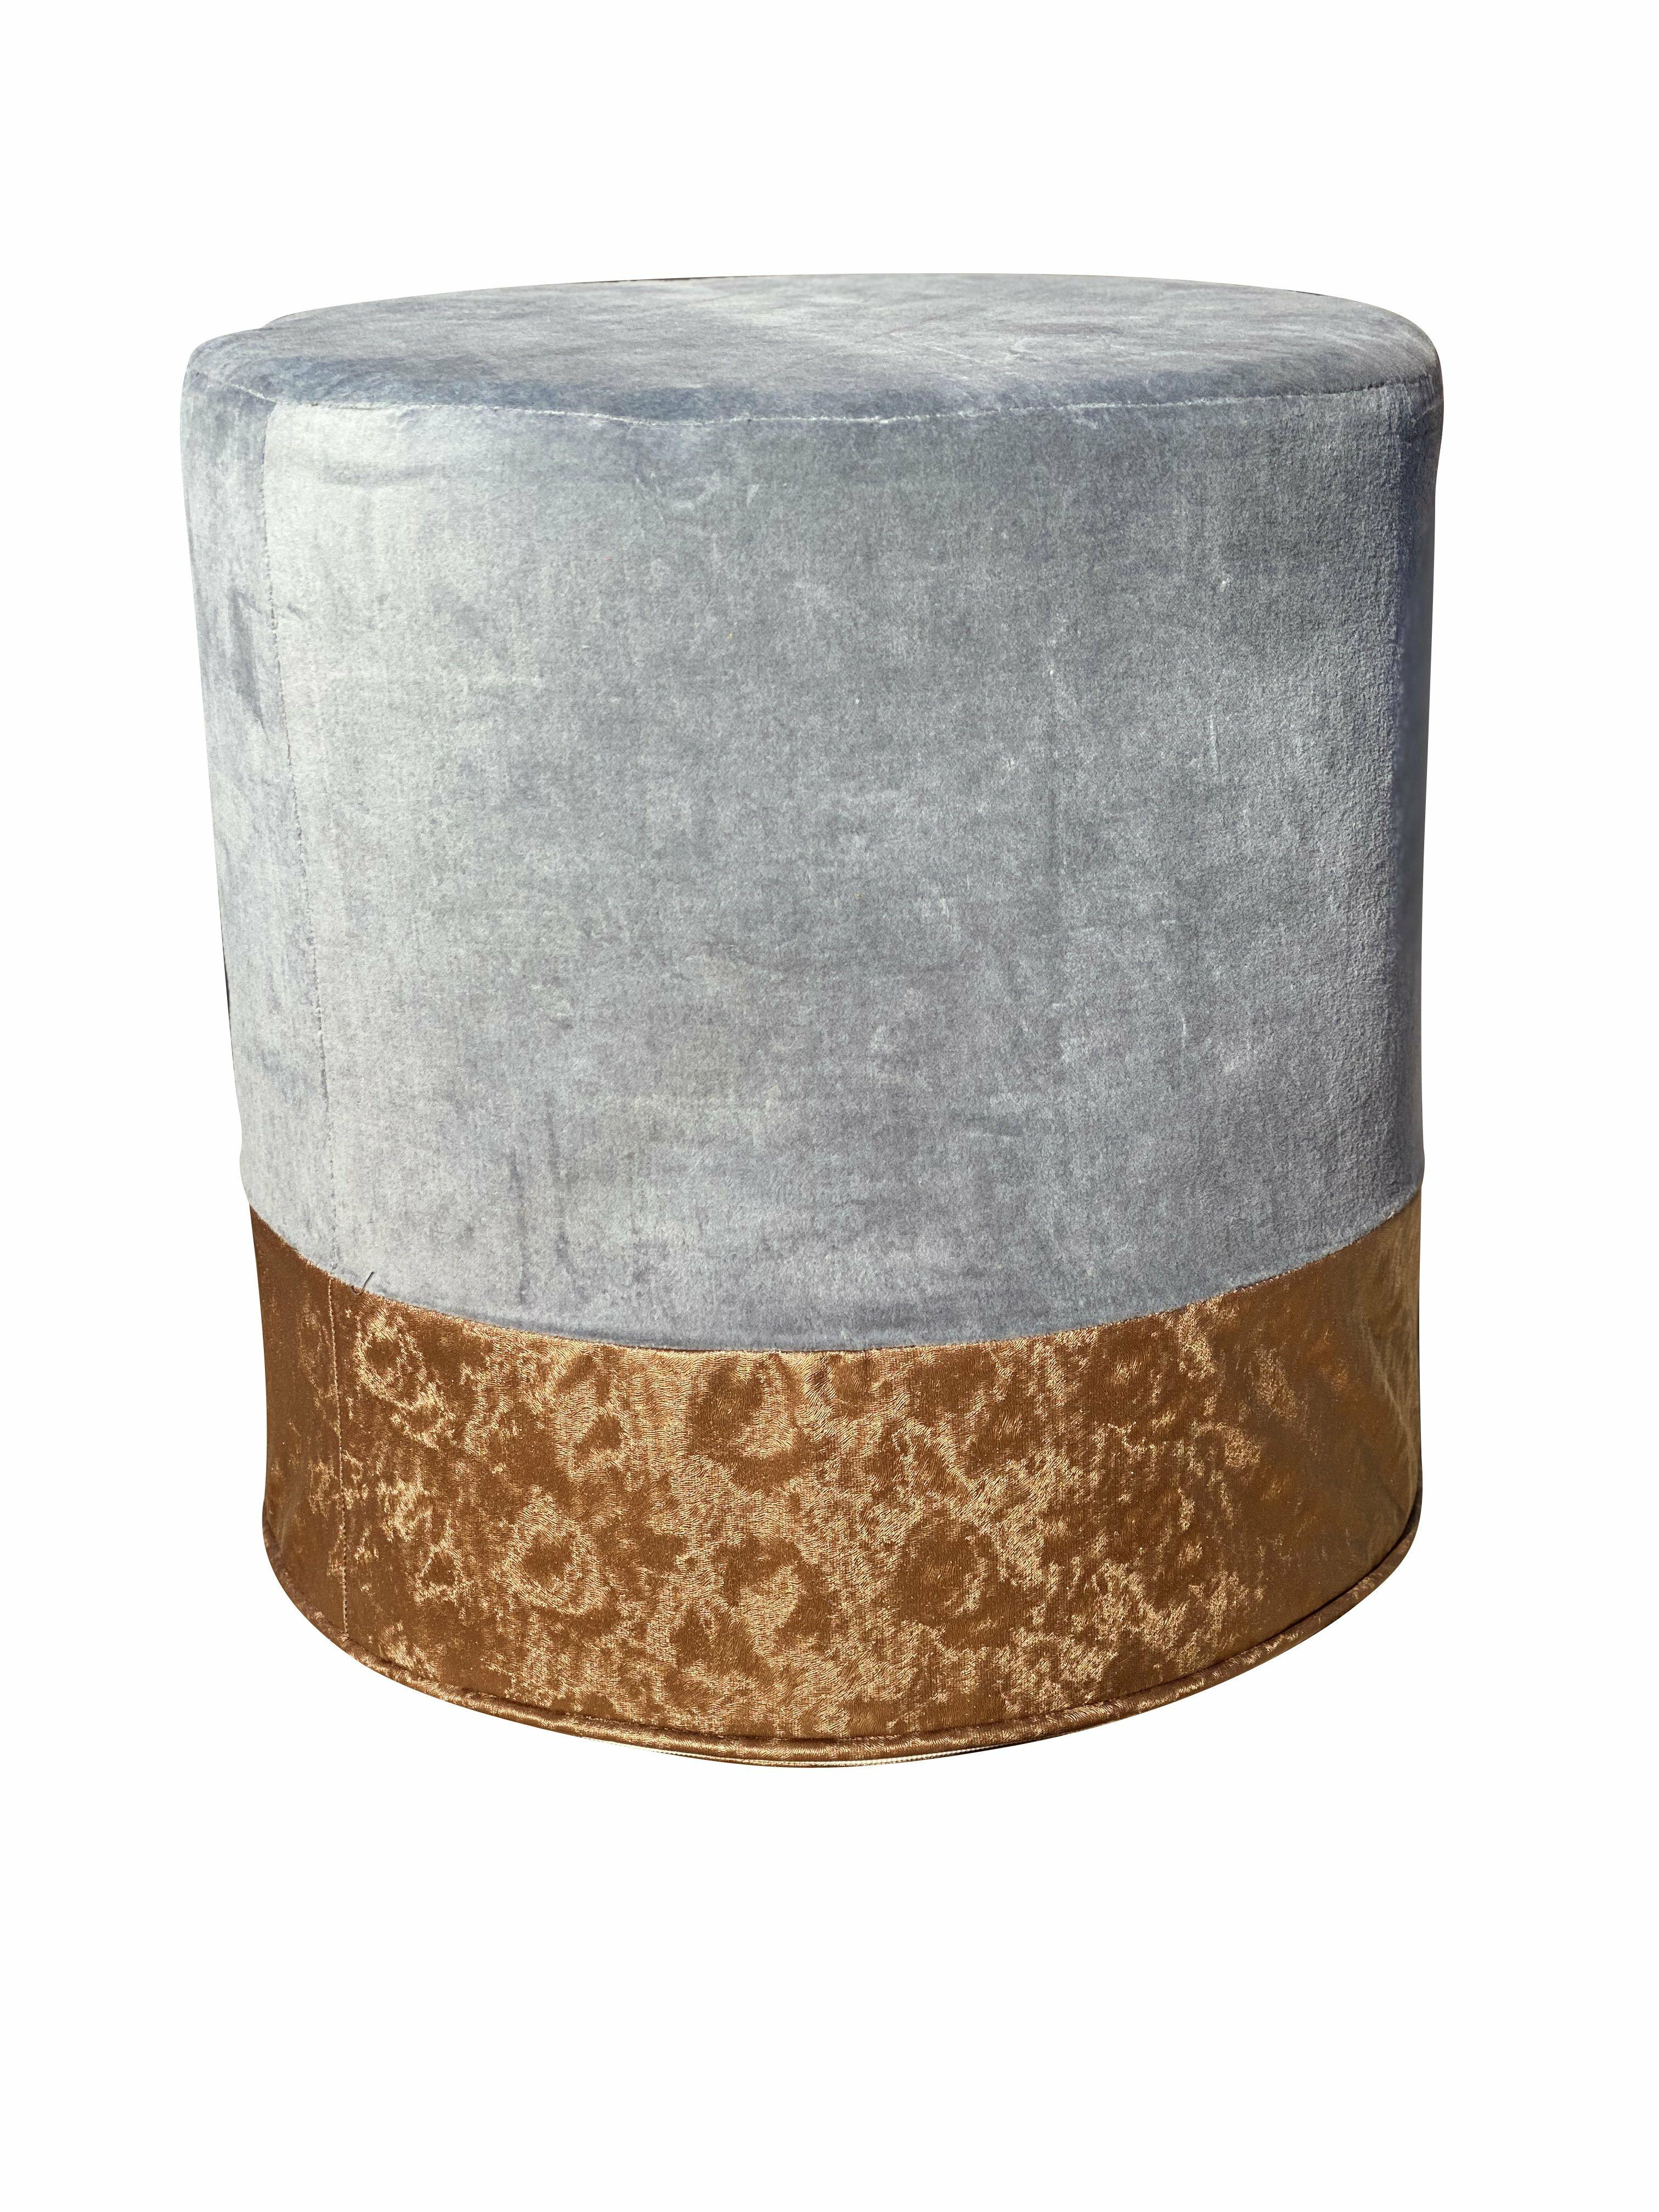 everly quinn cloran 18 round pouf ottoman w